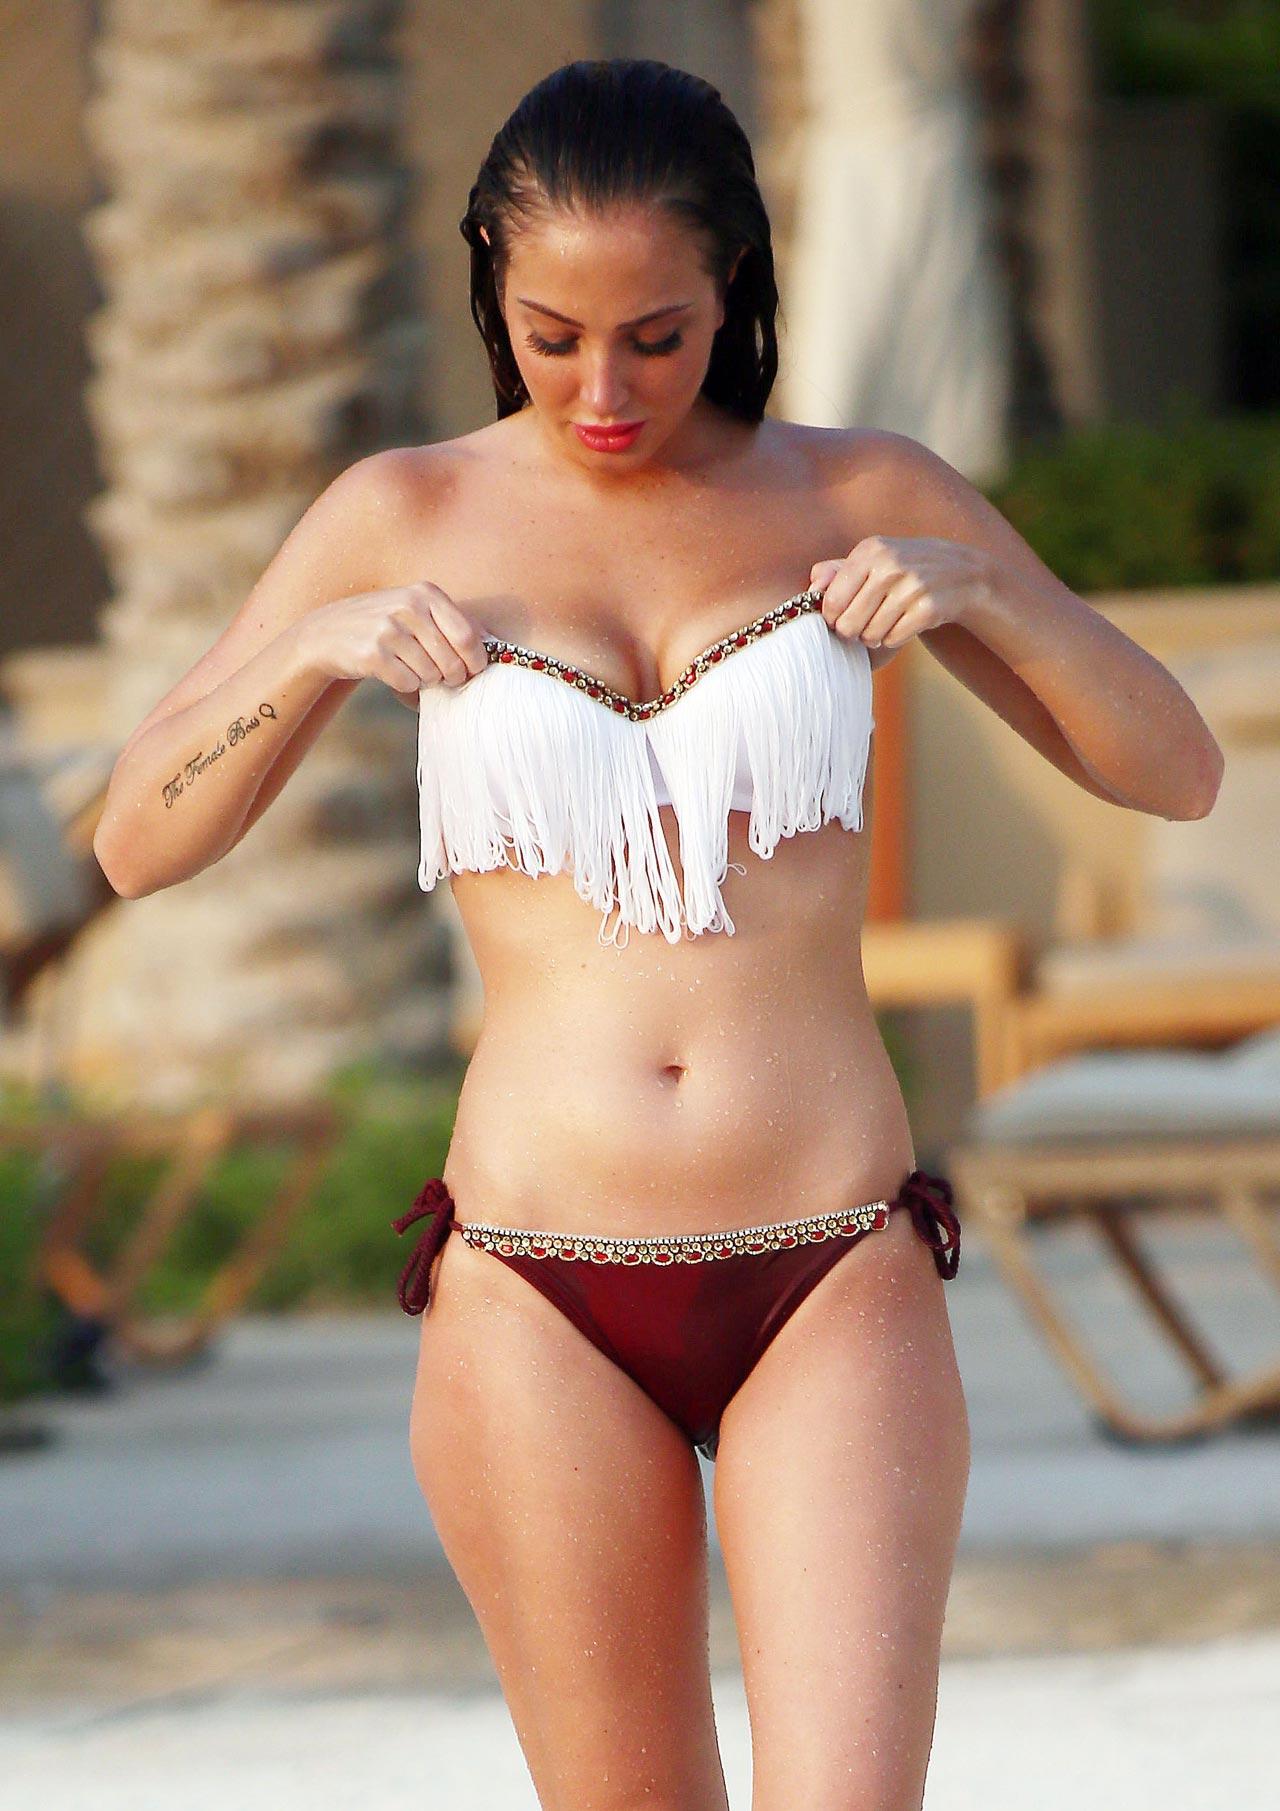 Boobs Kelli Berglund  nude (94 photos), Snapchat, legs